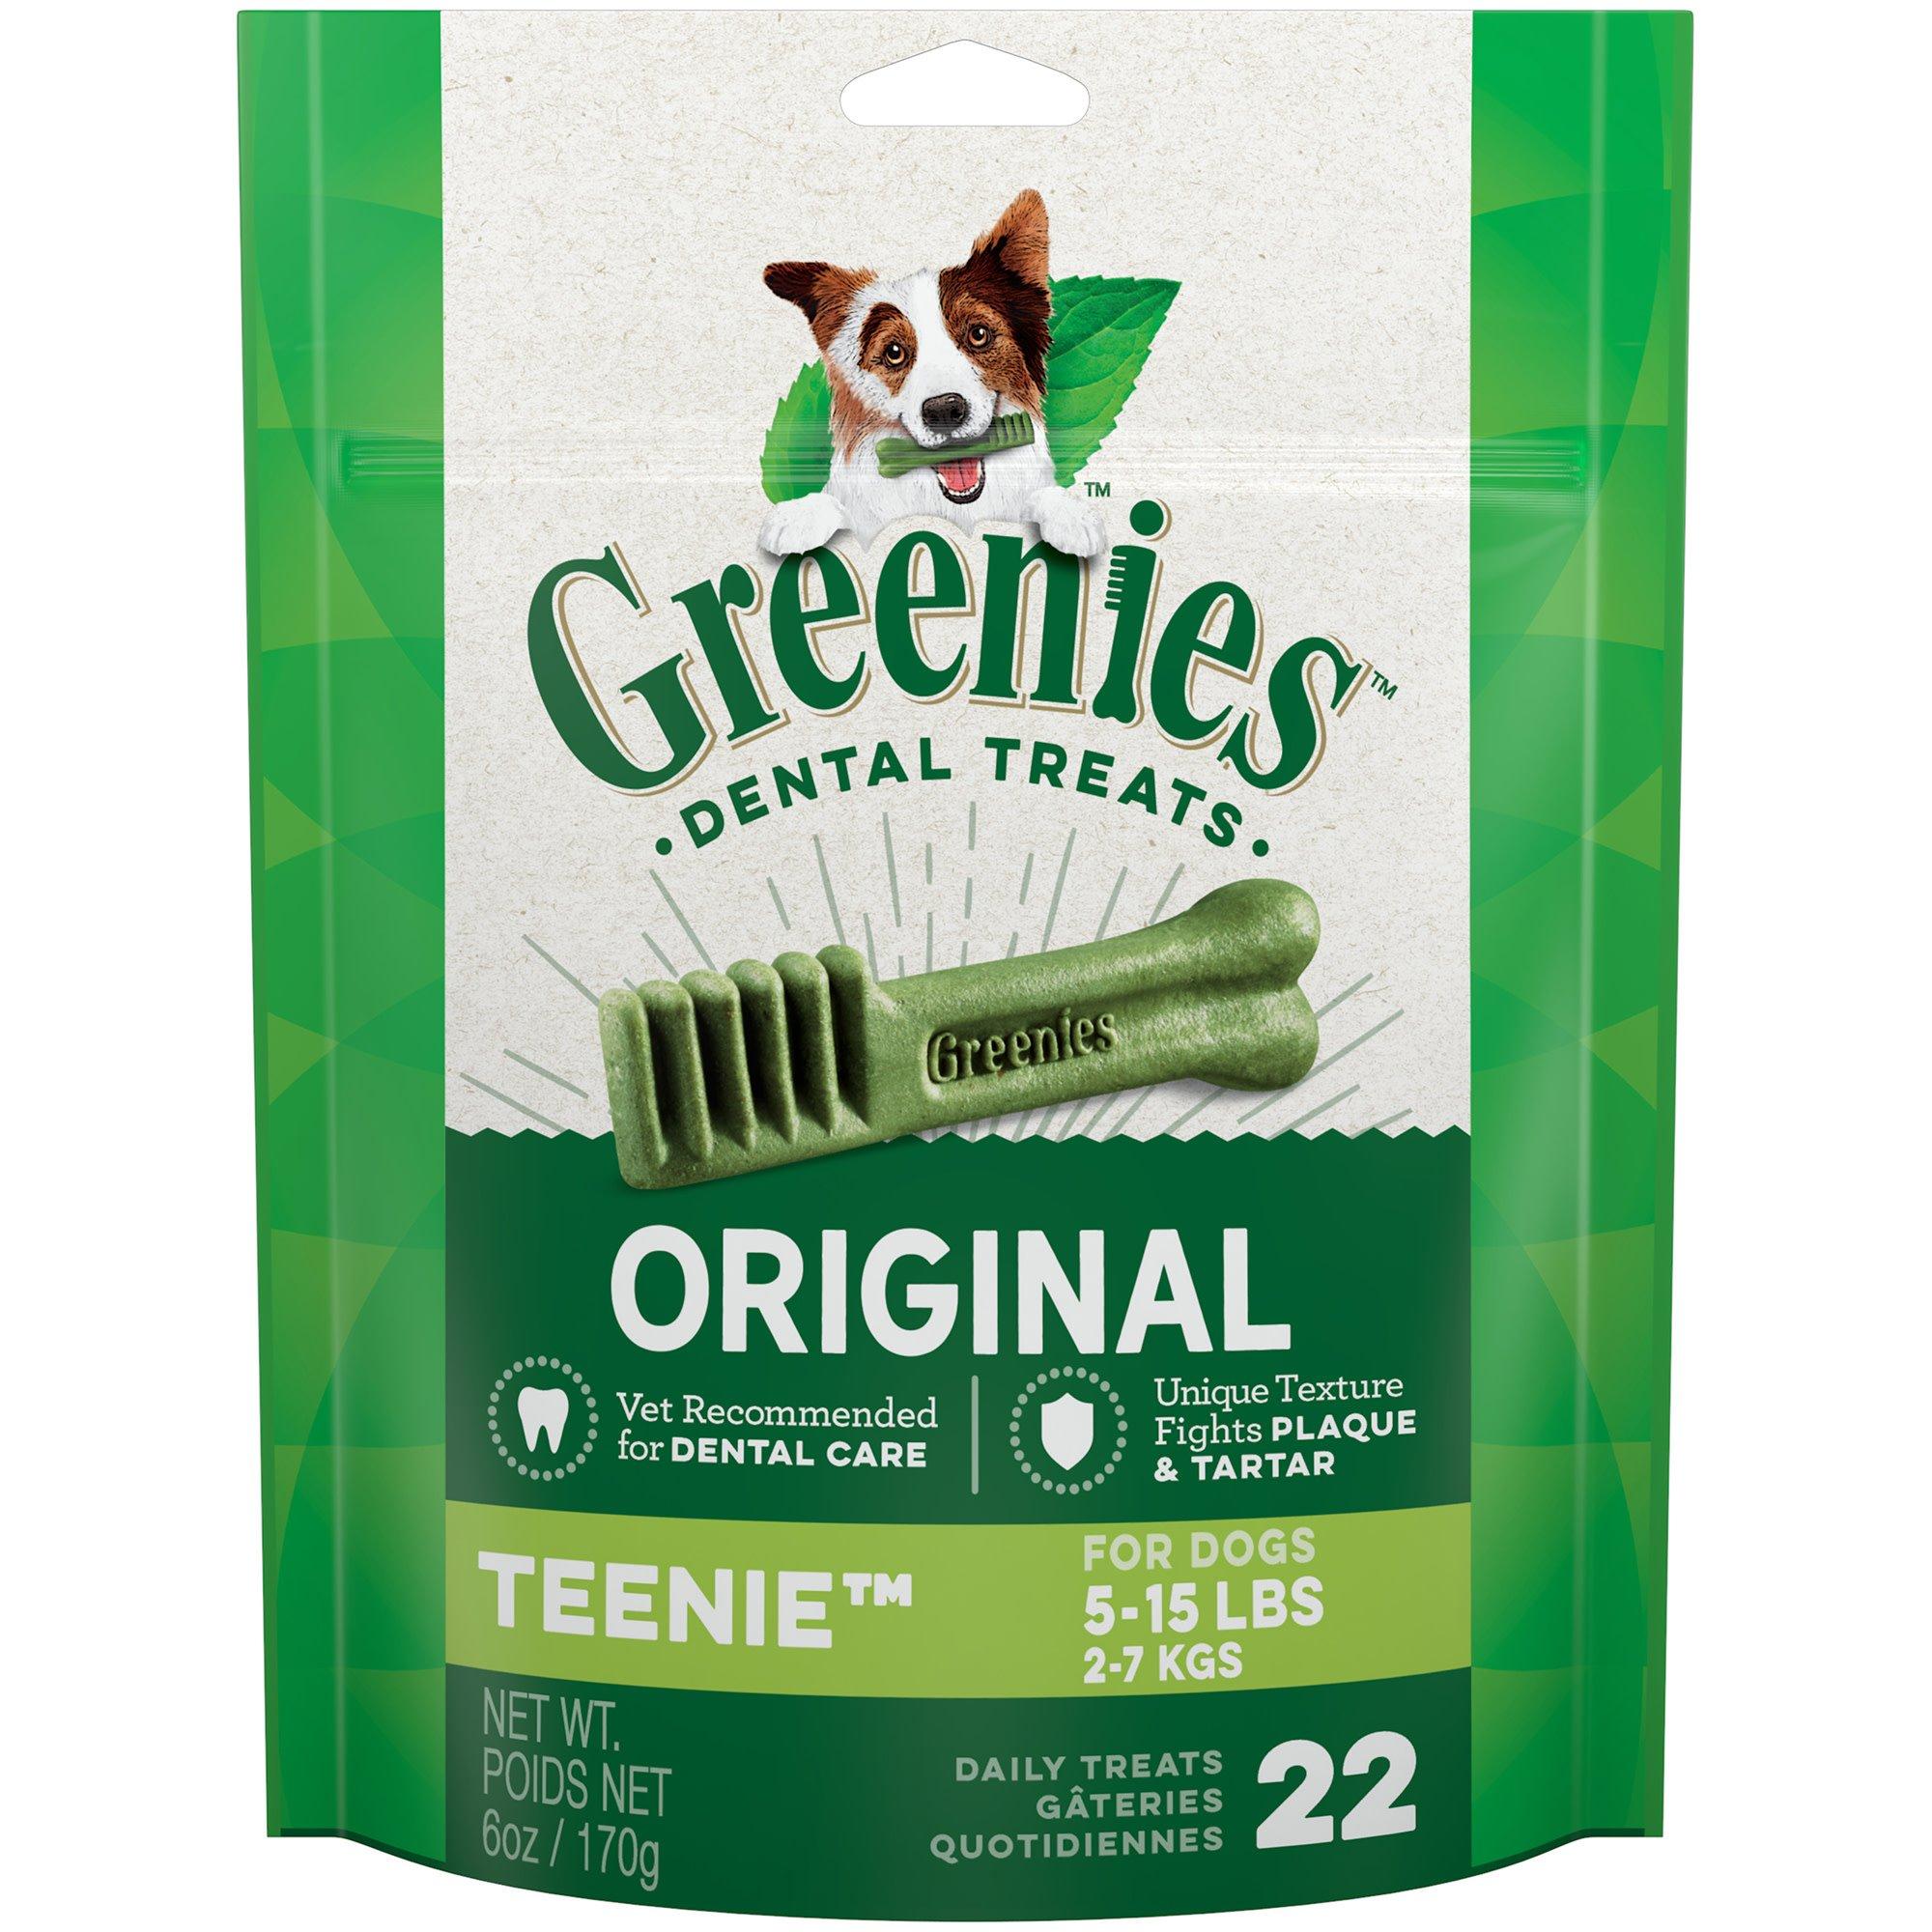 Greenies Original Teenie Dental Dog Treats, 22-count